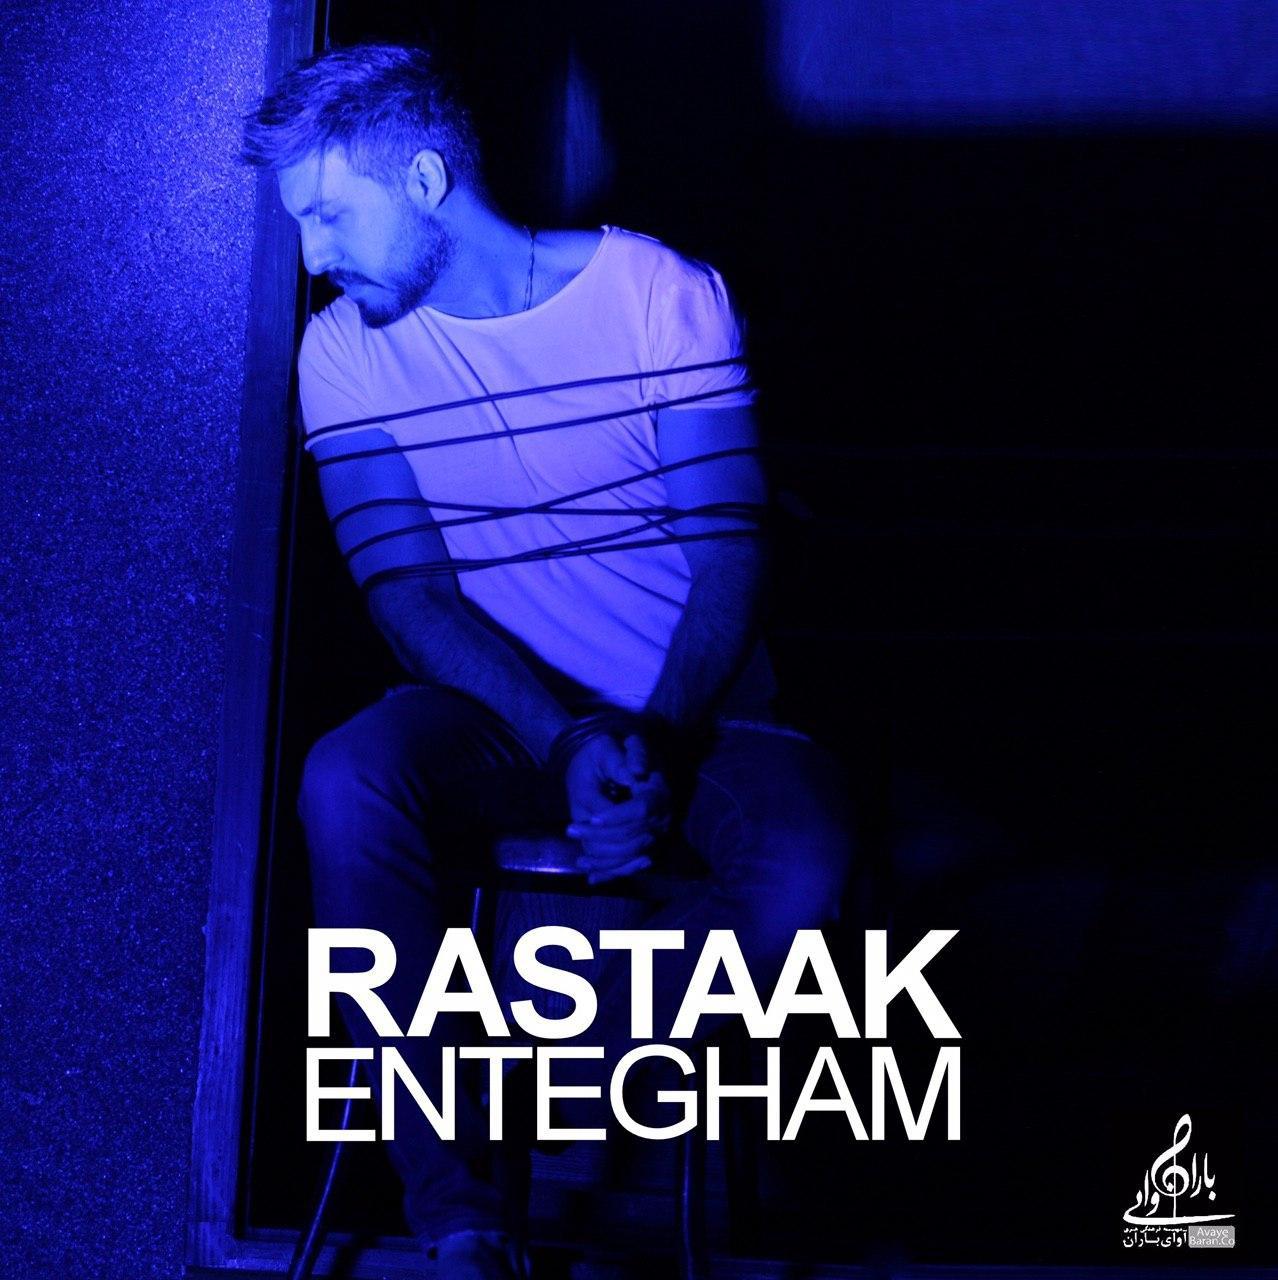 Rastaak - Entegham - دانلود آهنگ رستاک به نام انتقام